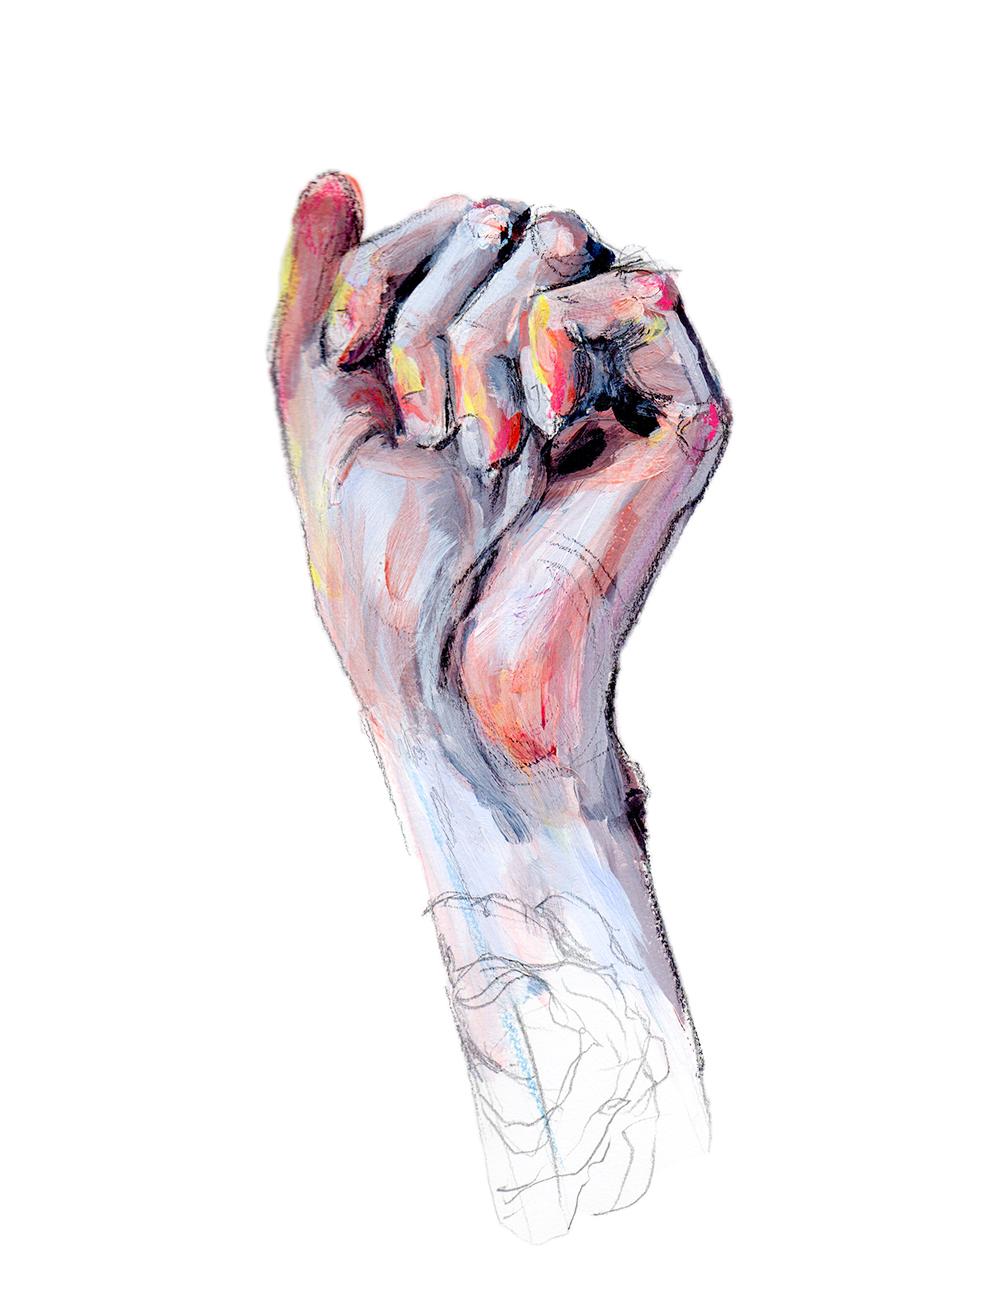 Hand Study - Fist 1